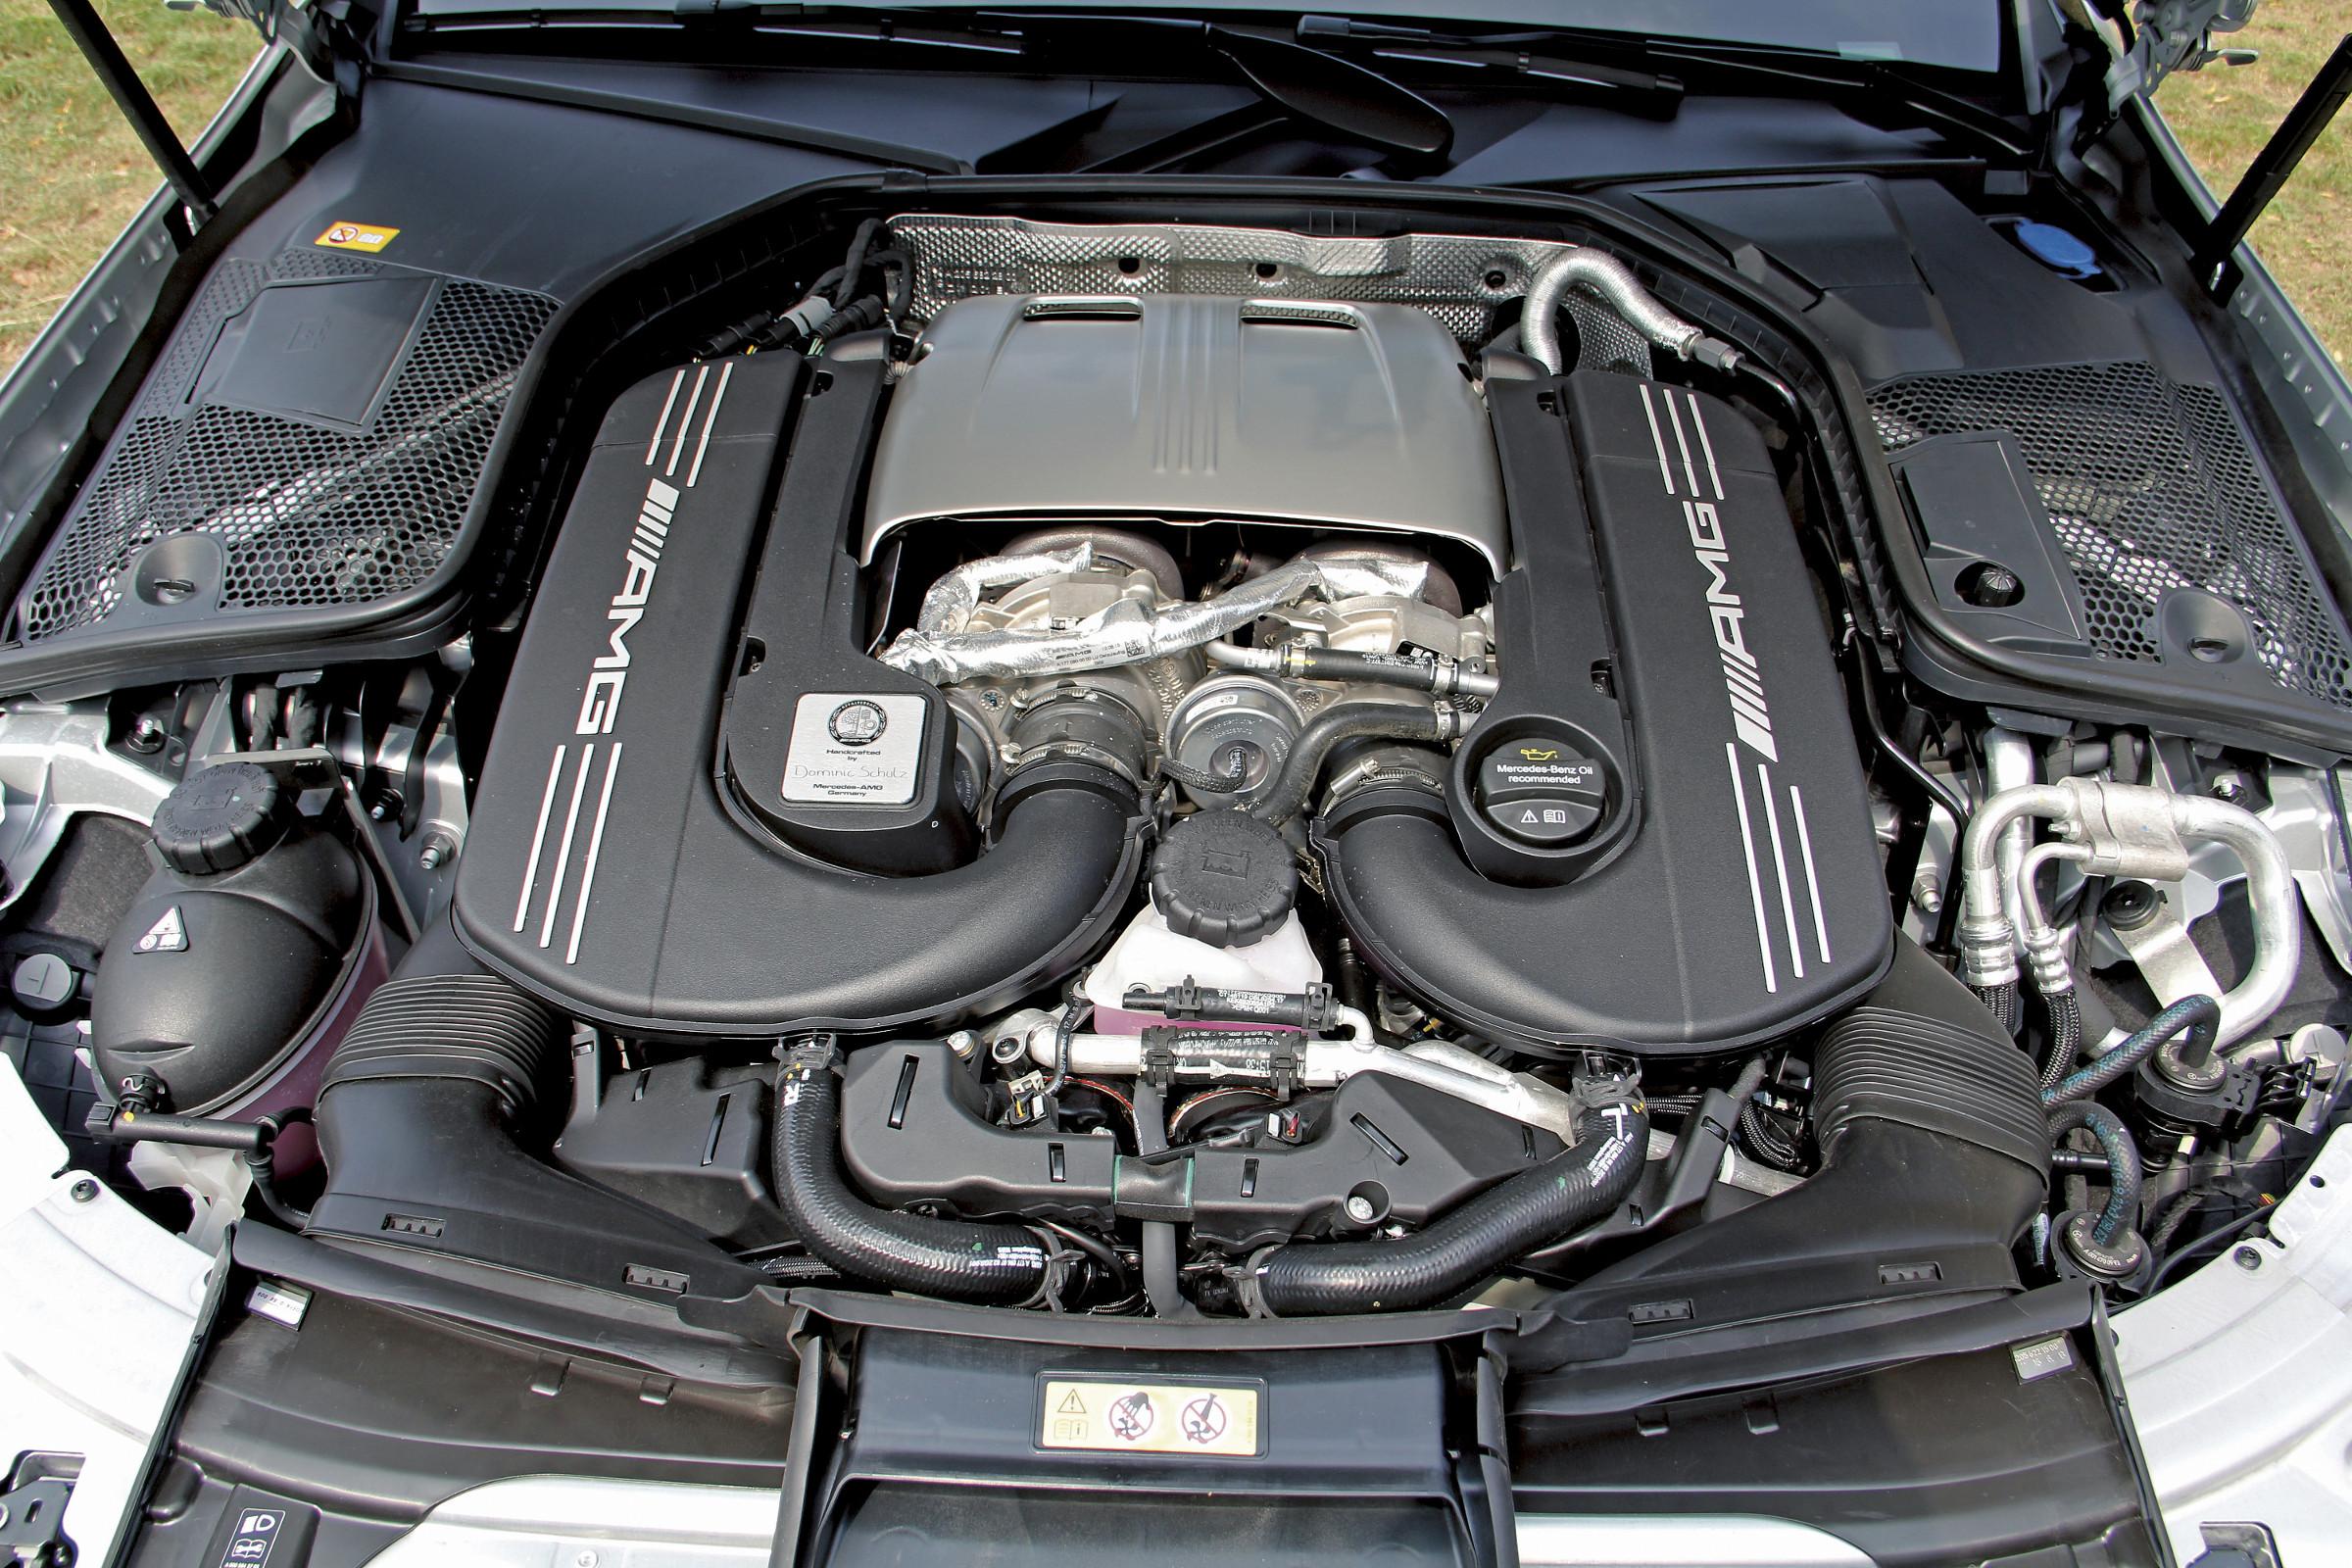 2016 Posaidon Mercedes-Benz C63 AMG